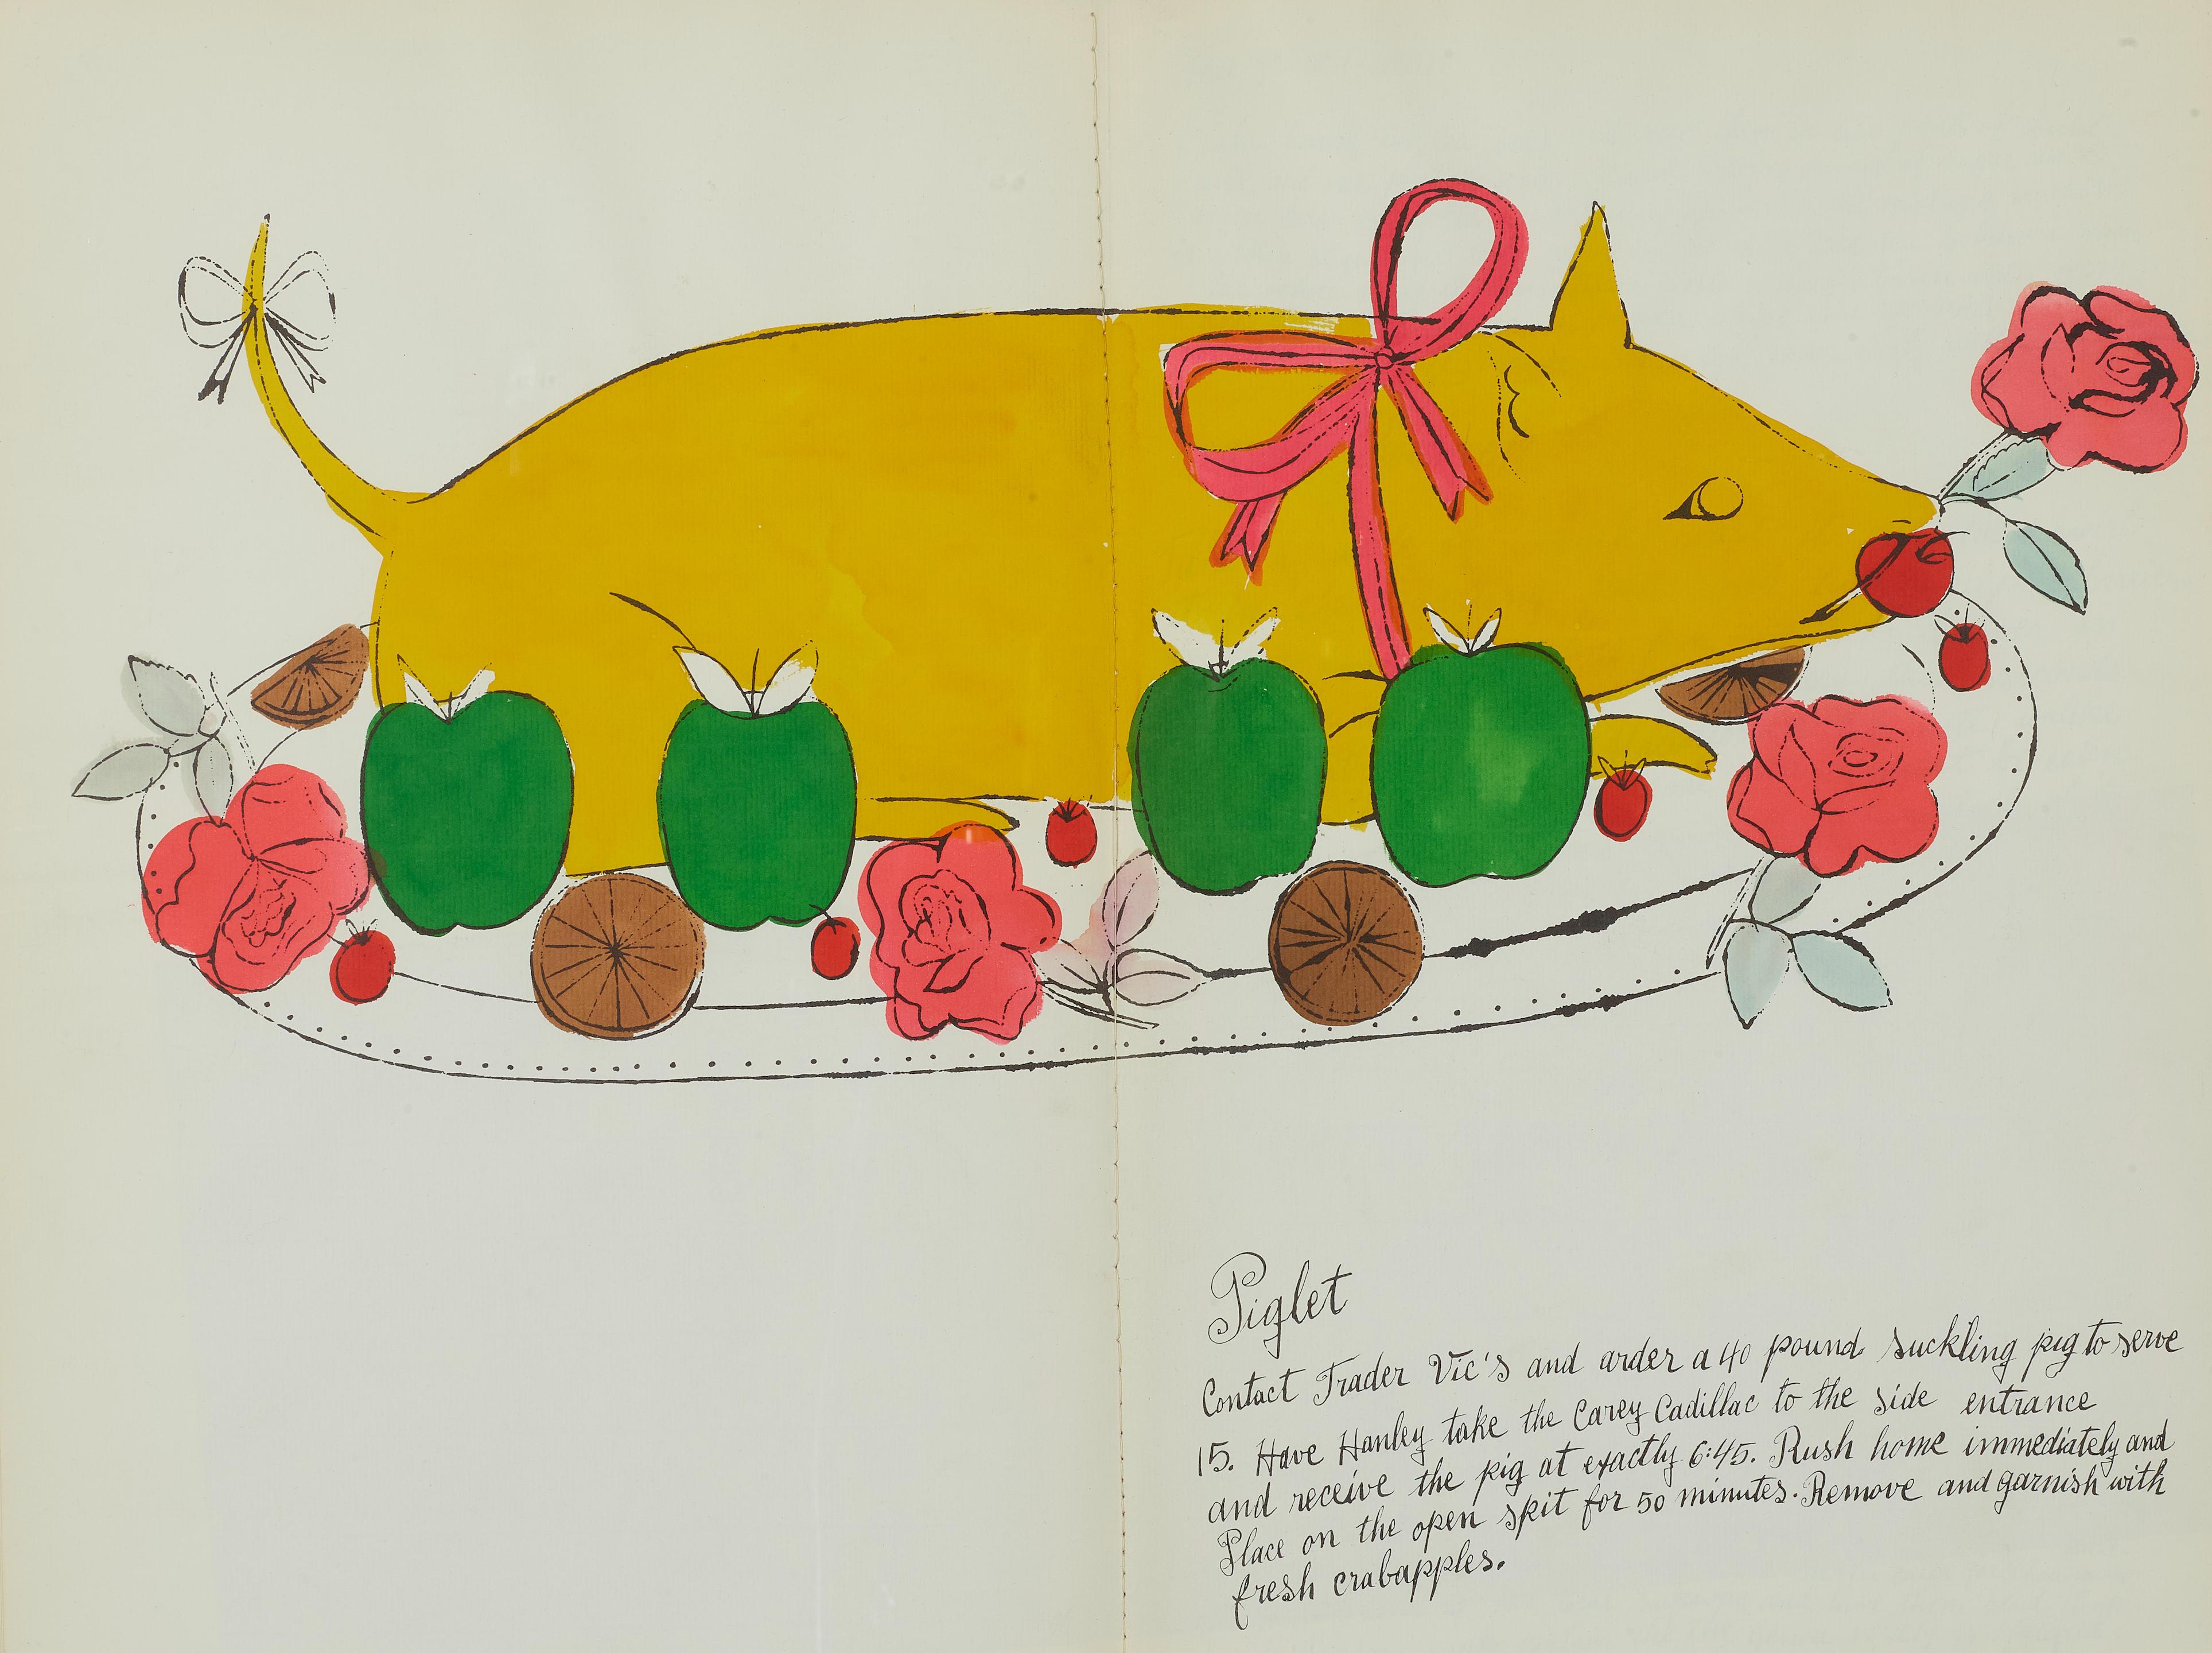 WILD RASPBERRIES, INSCRIBED TO FASHION ICON D.D. RYAN. WARHOL, ANDY. 1928-1987; and SUSIE FRANKFURT (RECIPES). Wild Raspberries. [New York: Printed by Seymour Berlin, 1959.]